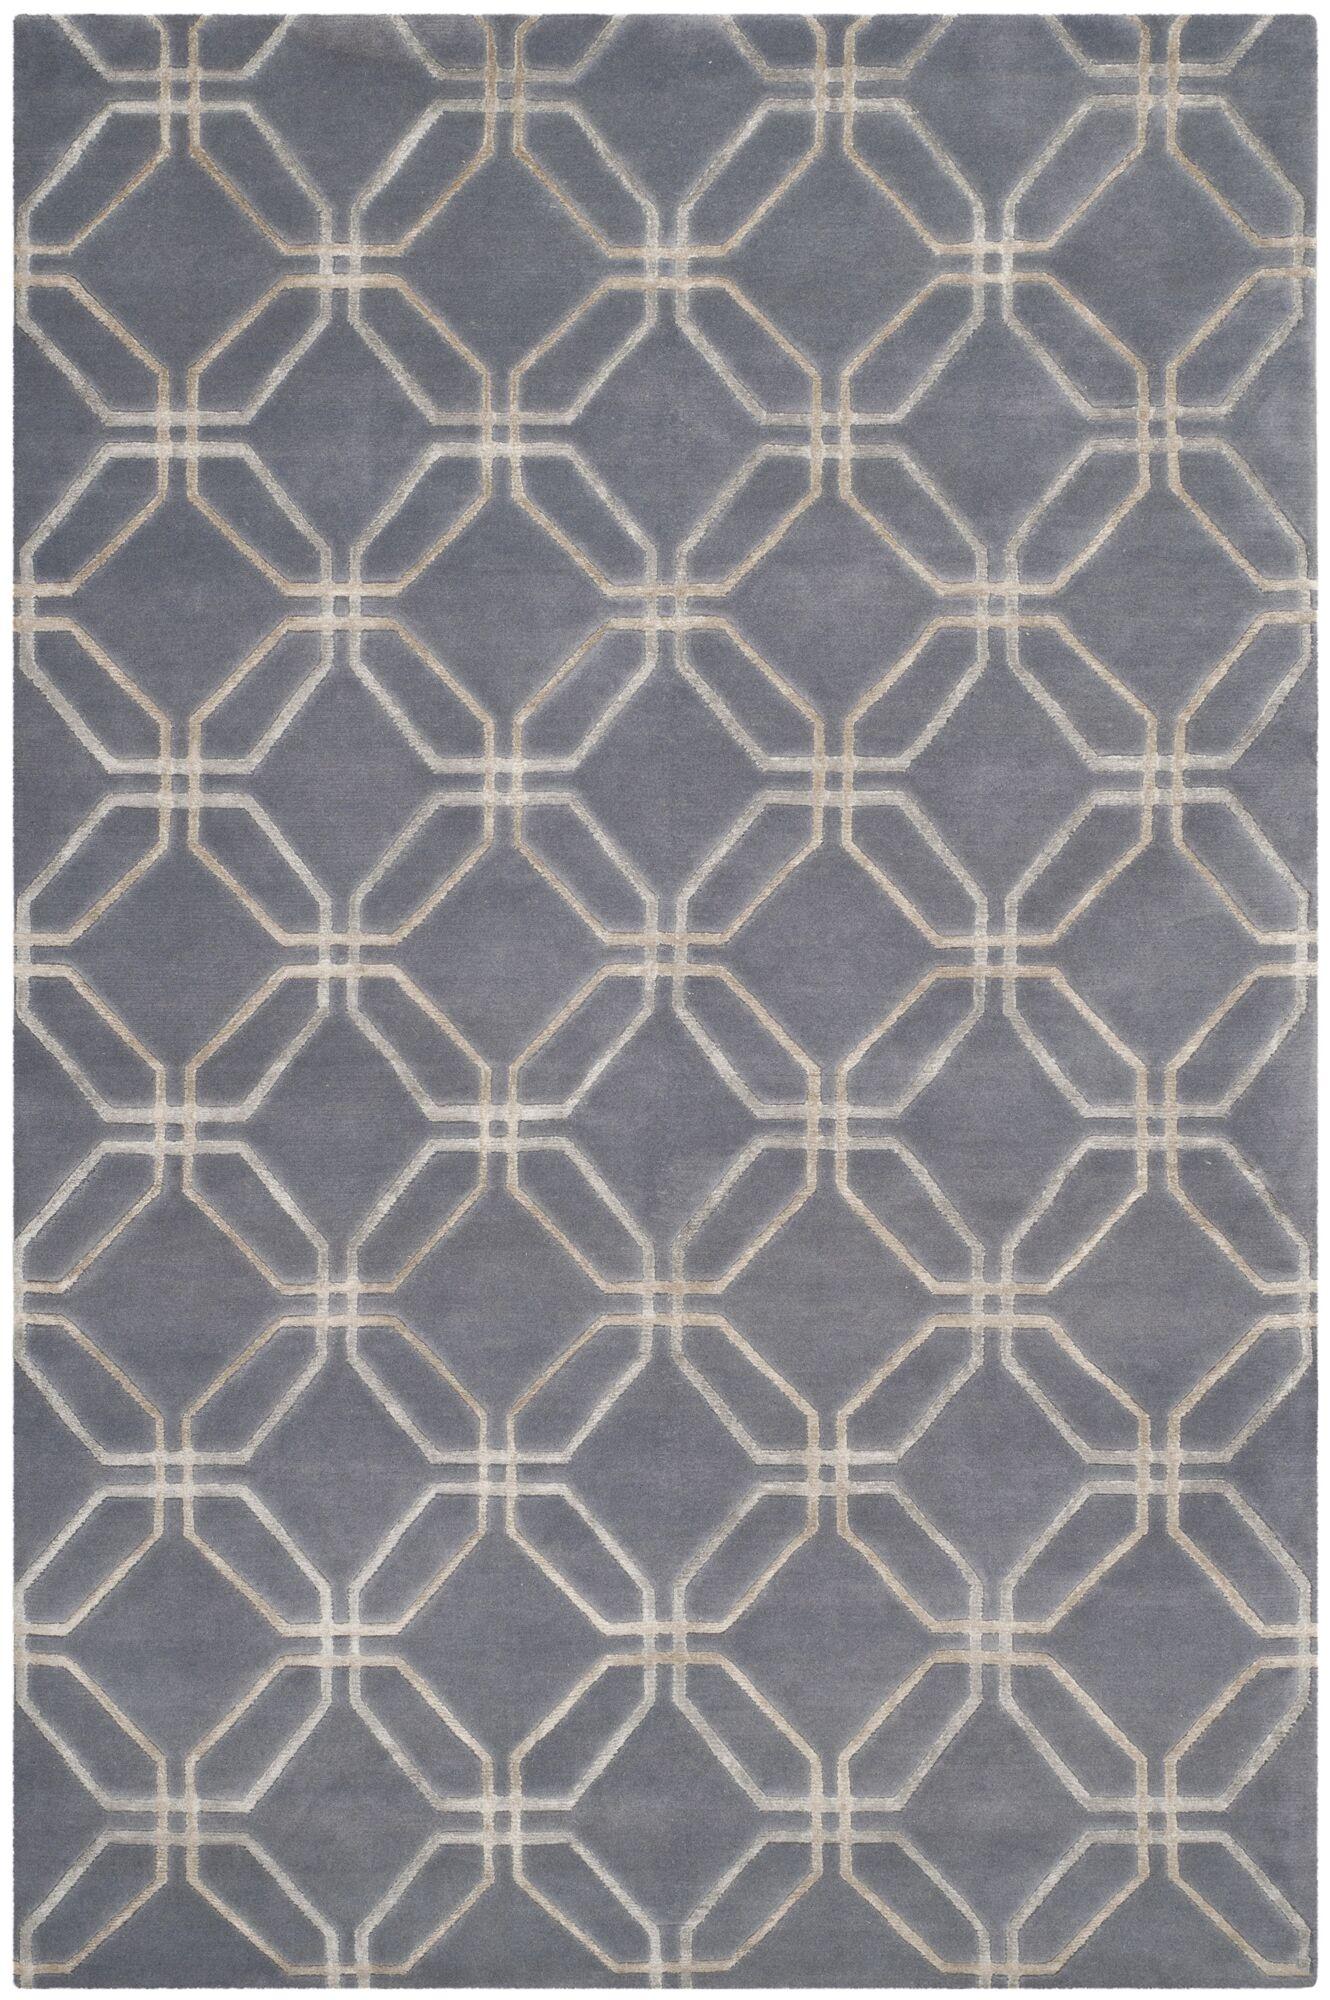 Slate Geometric Rug Rug Size: Rectangle 9' x 12'